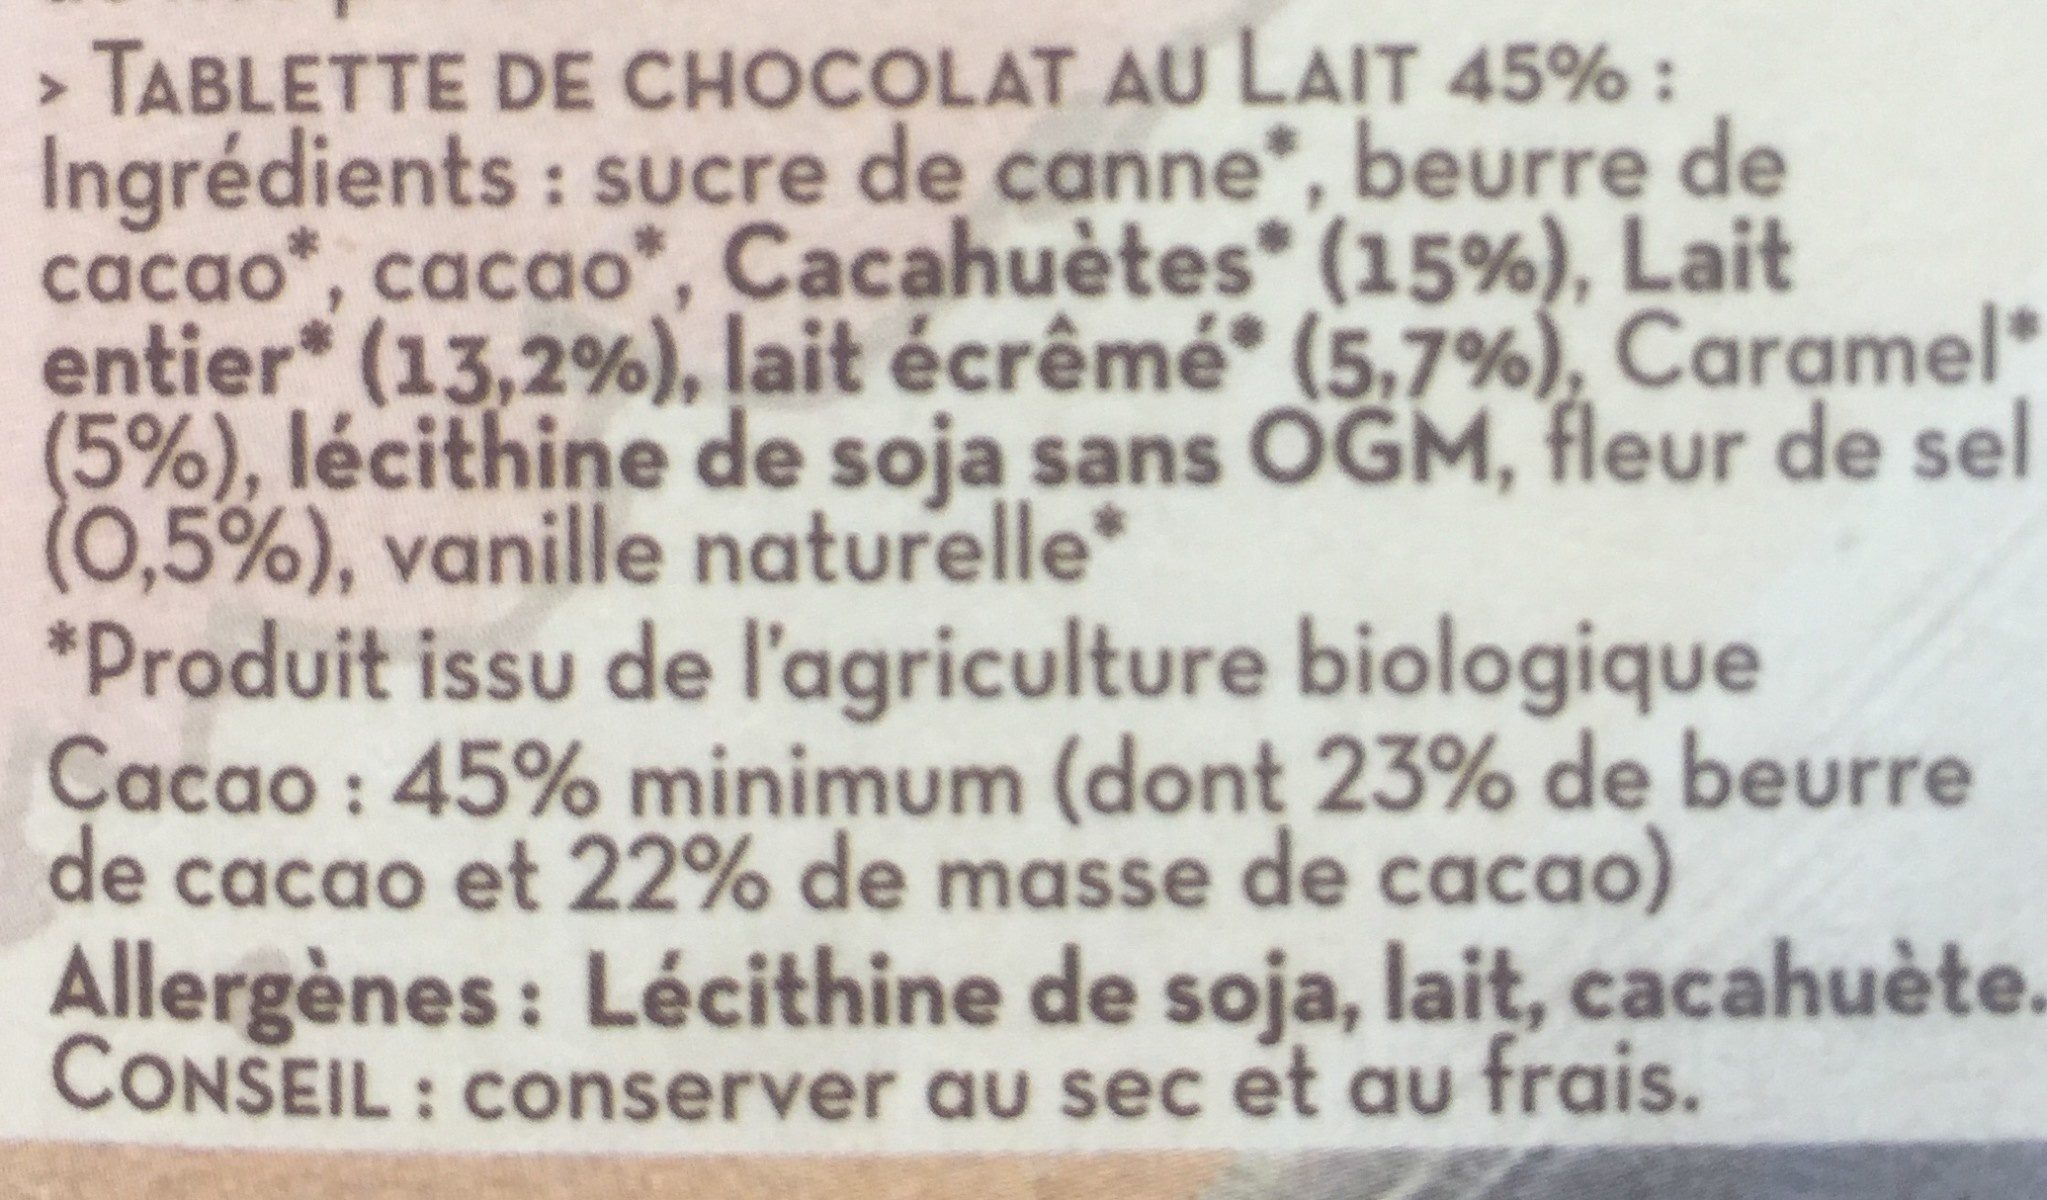 Lait cacahuetes caramel fleur de sel - Ingrediënten - fr